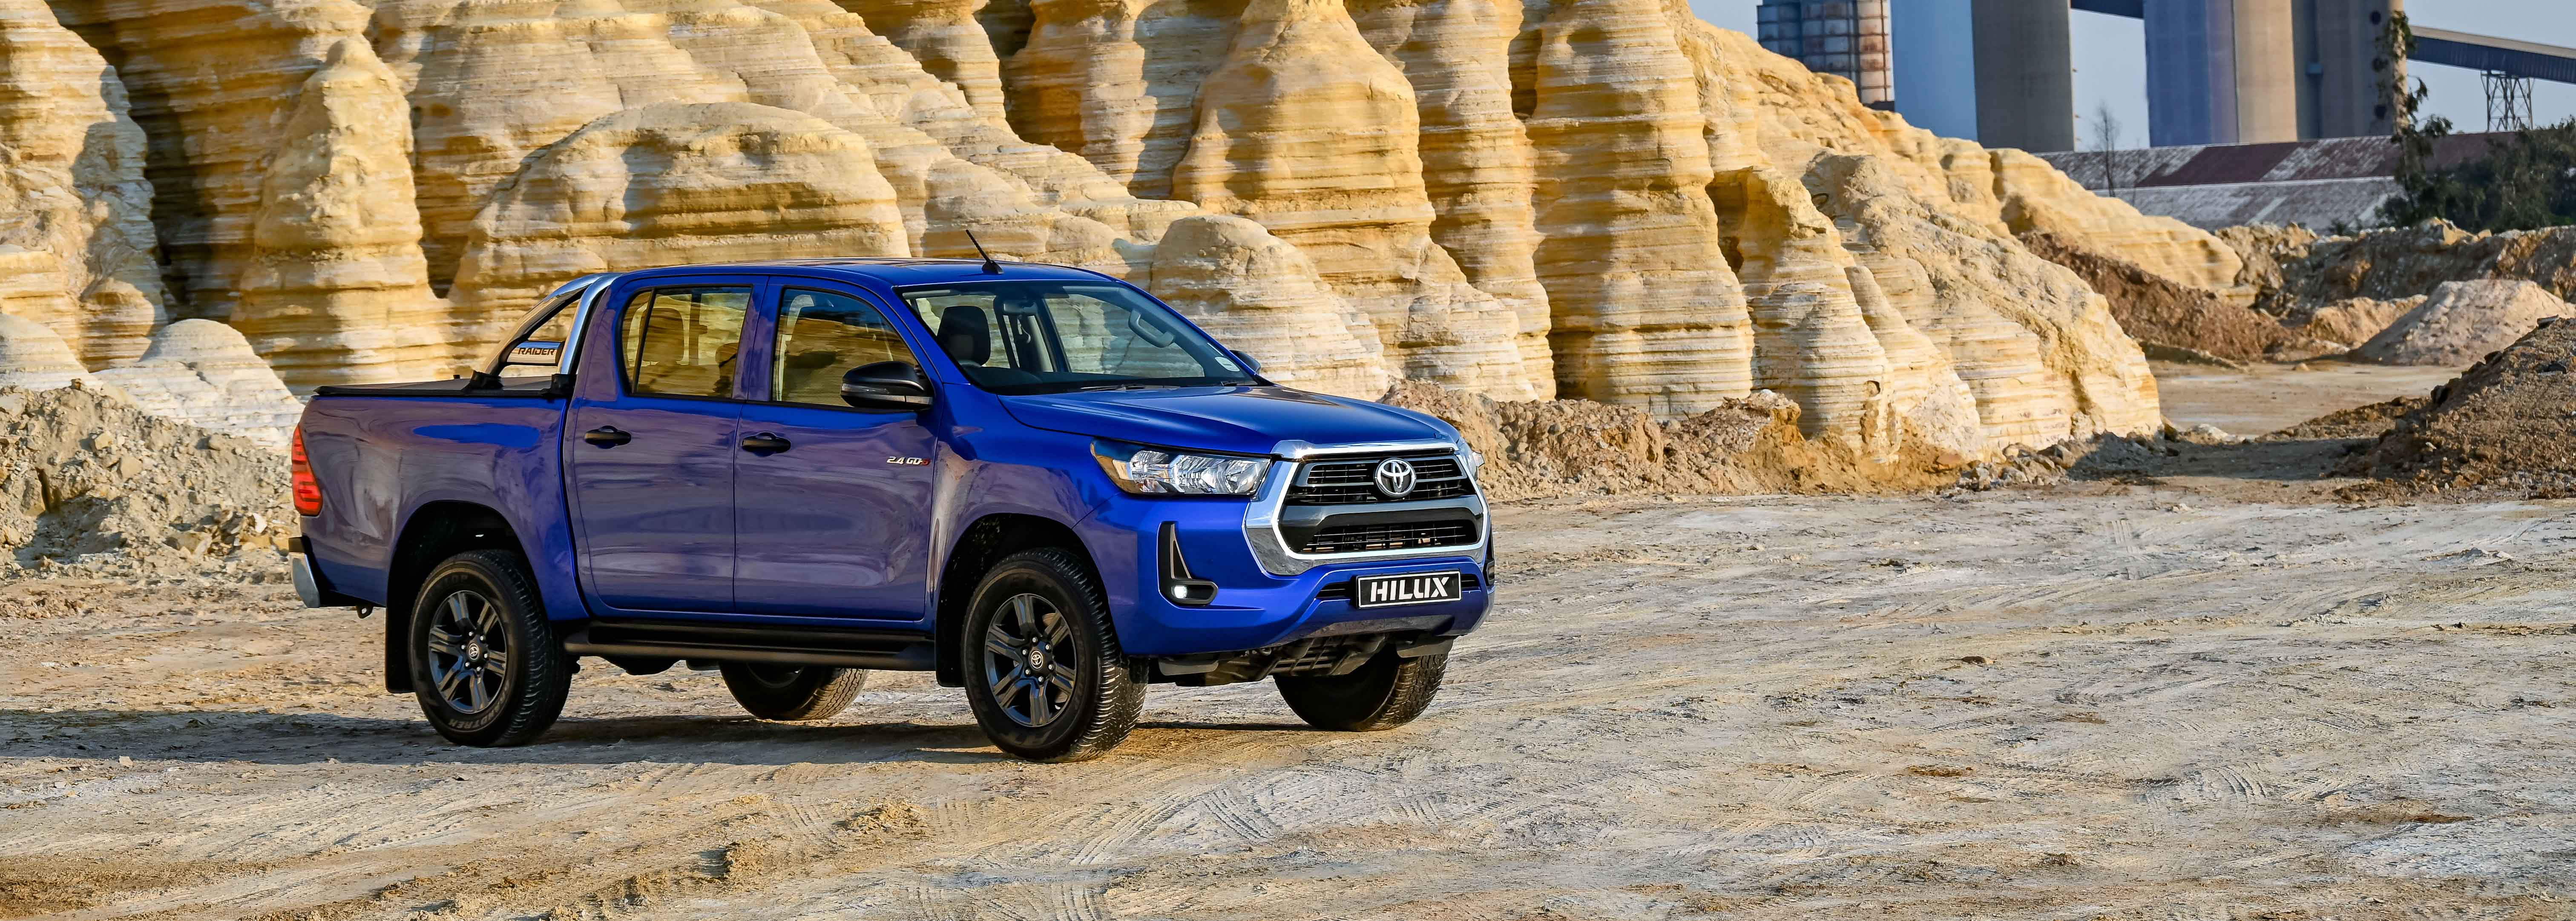 Toyota Hilux Raider receives specification upgrades